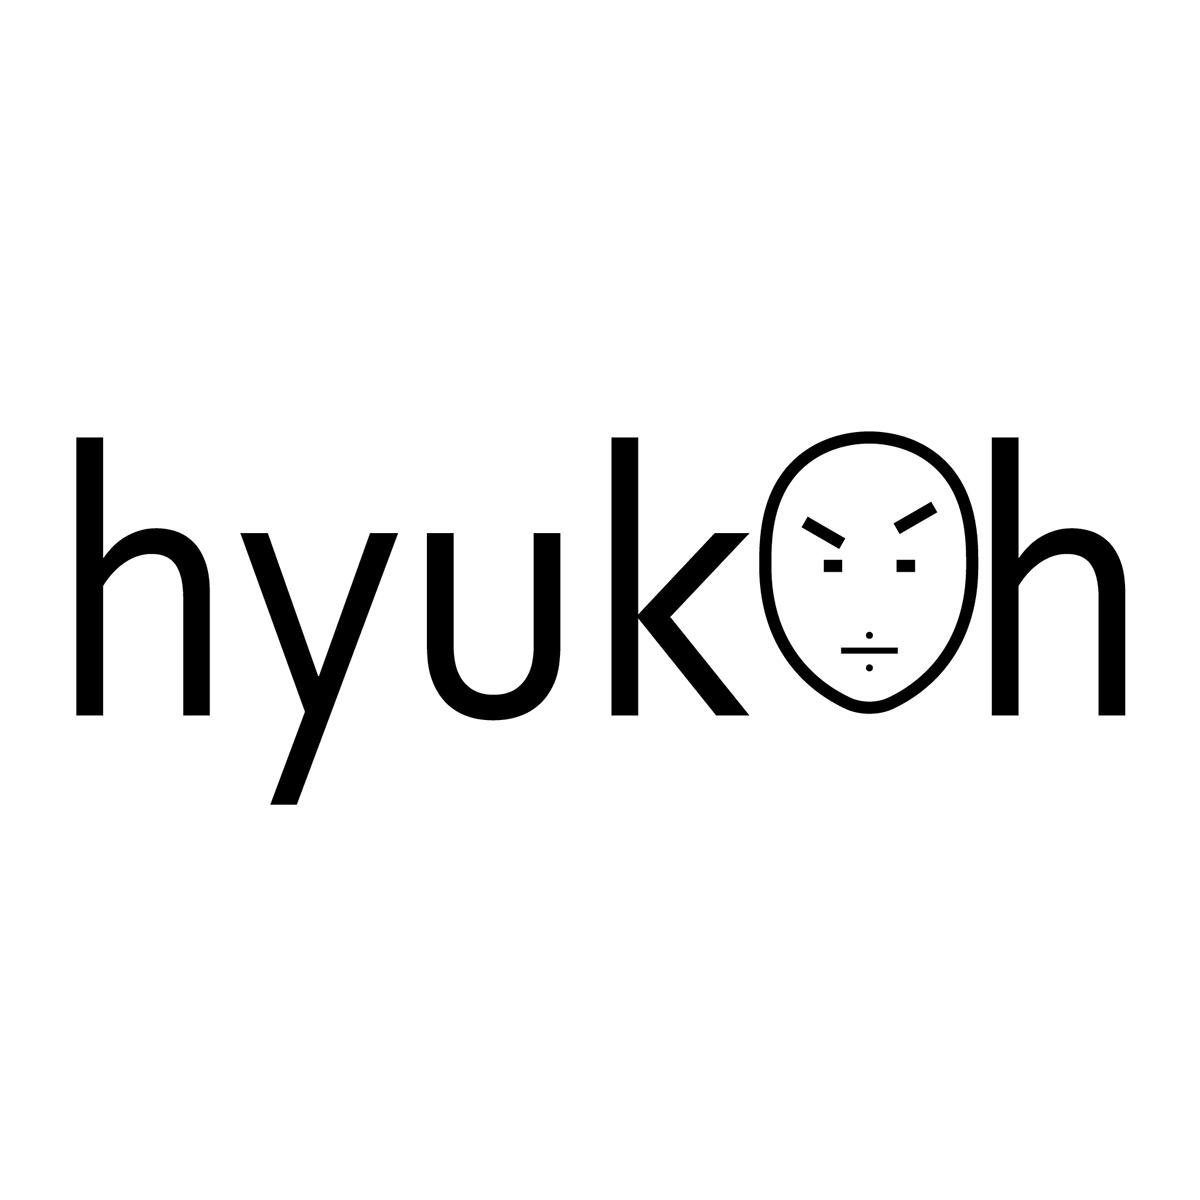 Band Hyukoh Rebranding on Behance